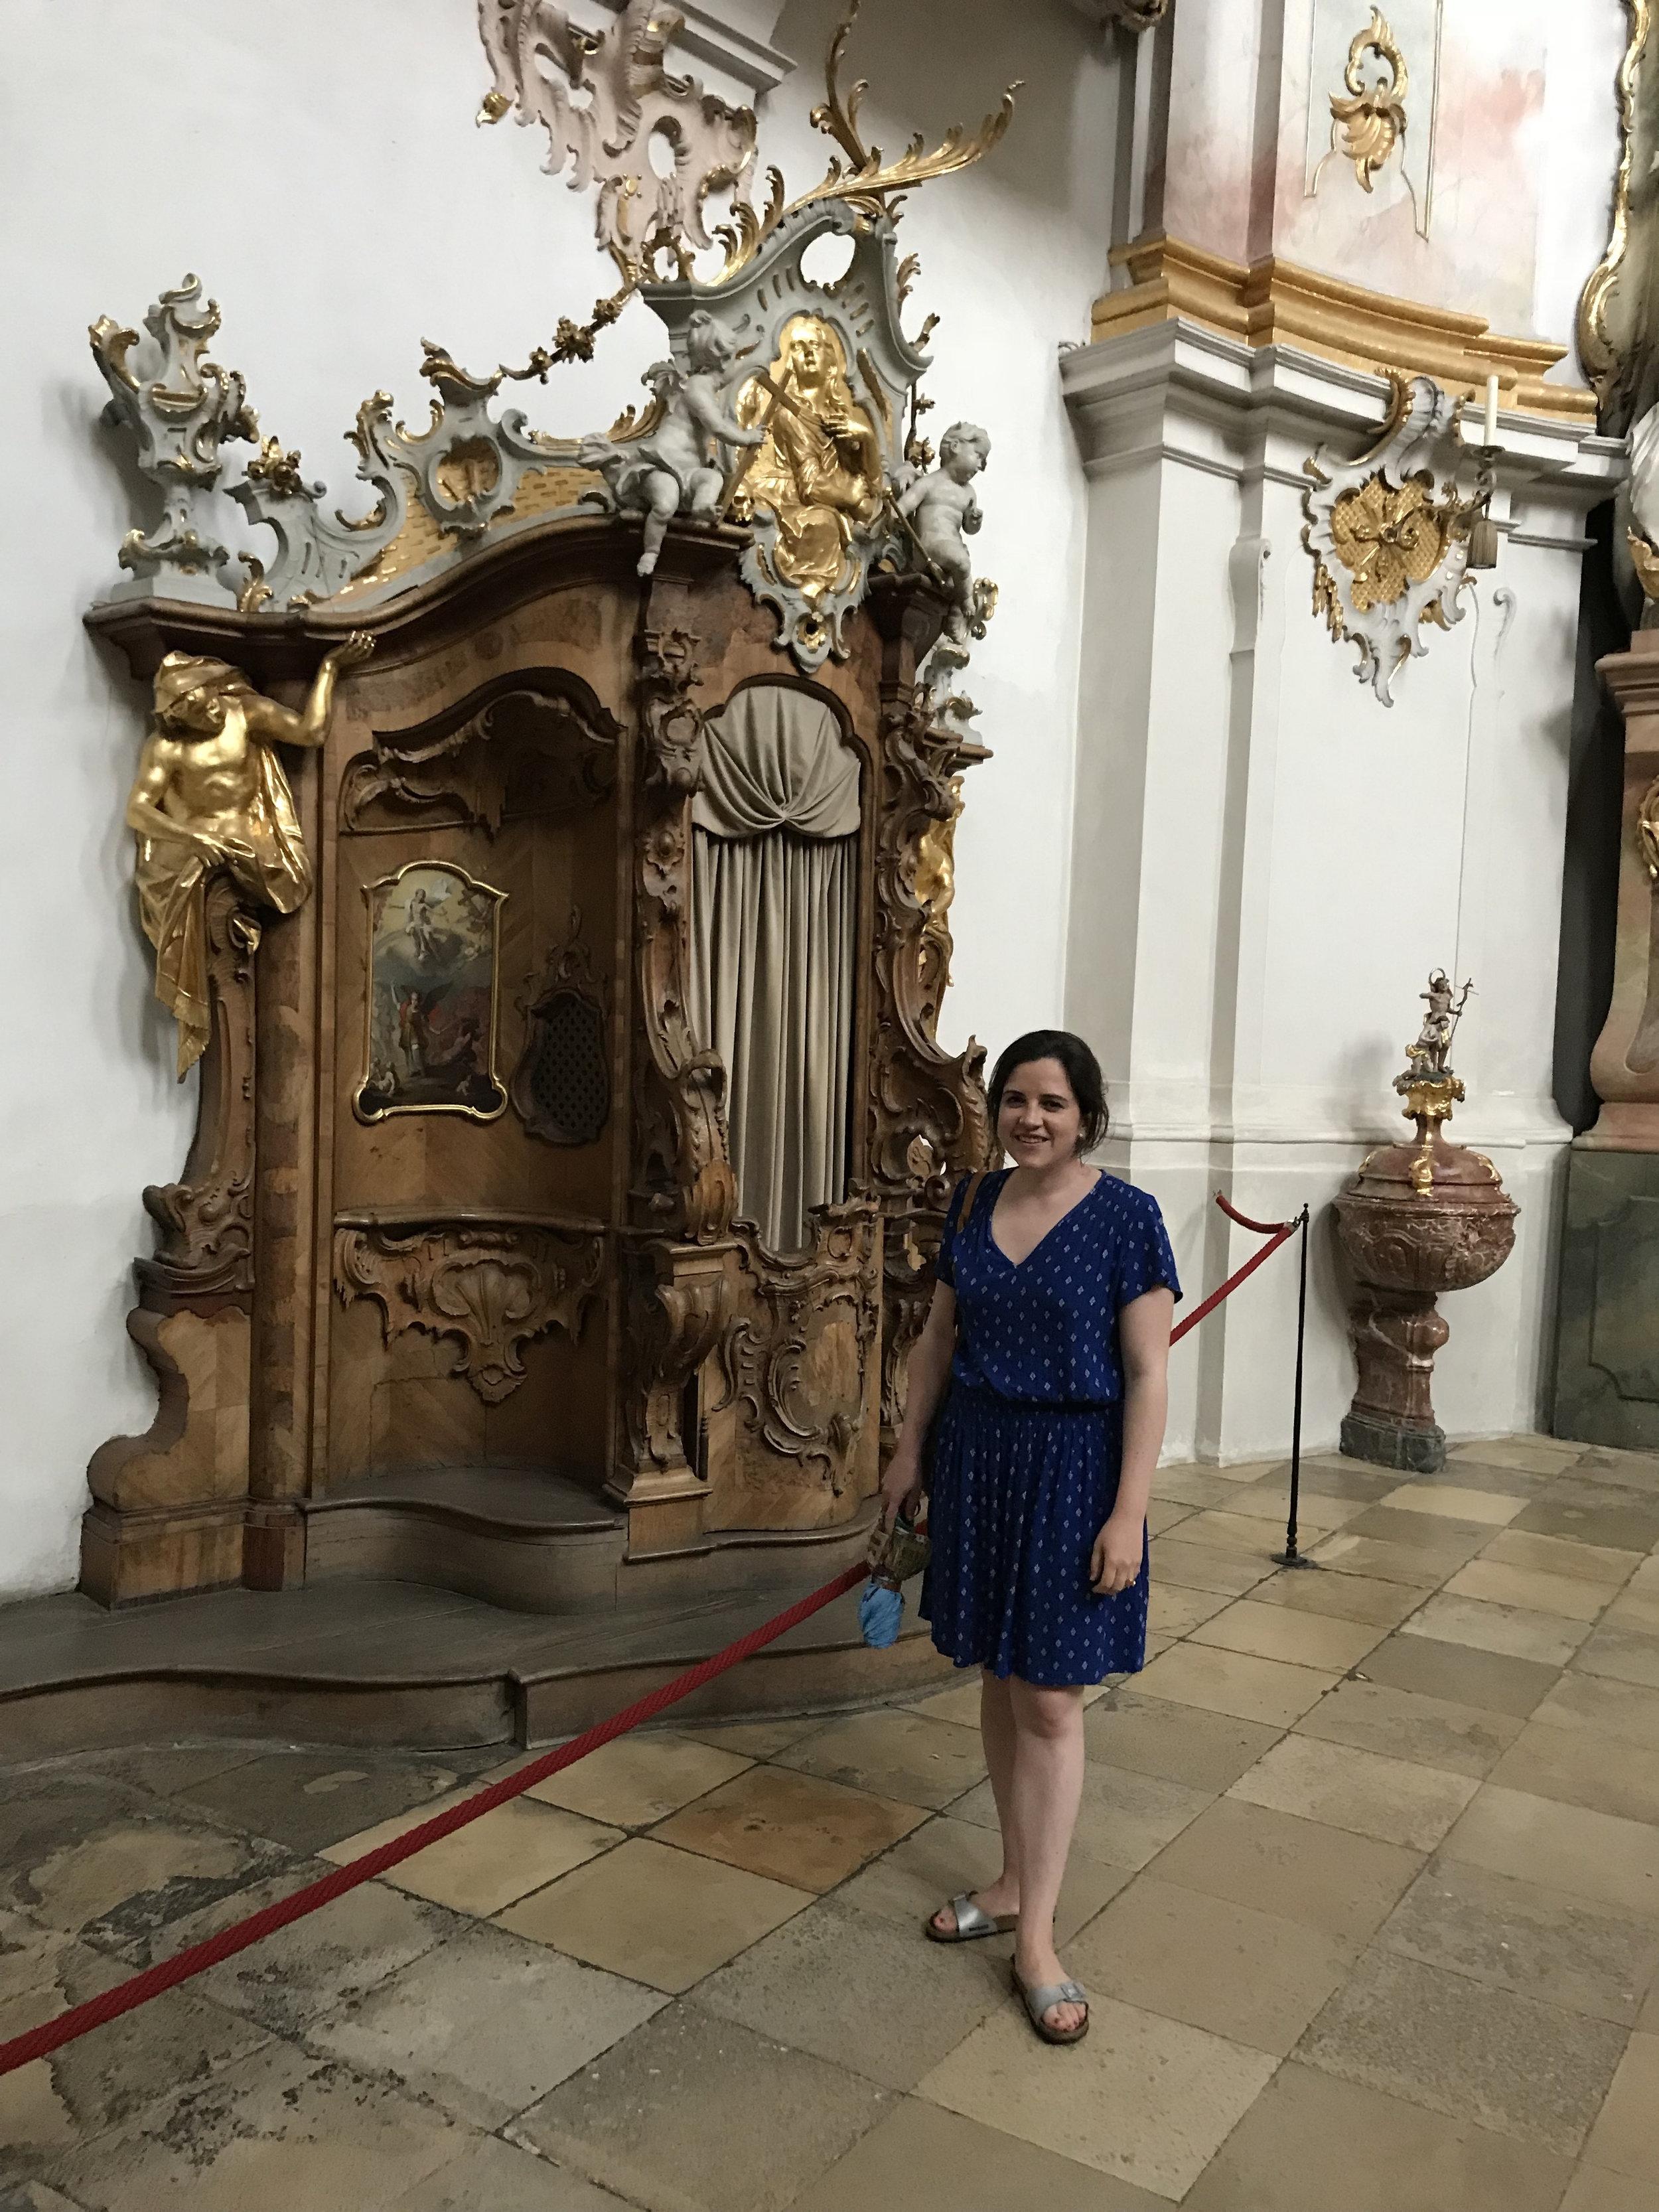 Teri_Bavaria_part3_monastery_spiritedtable_photo09.jpg